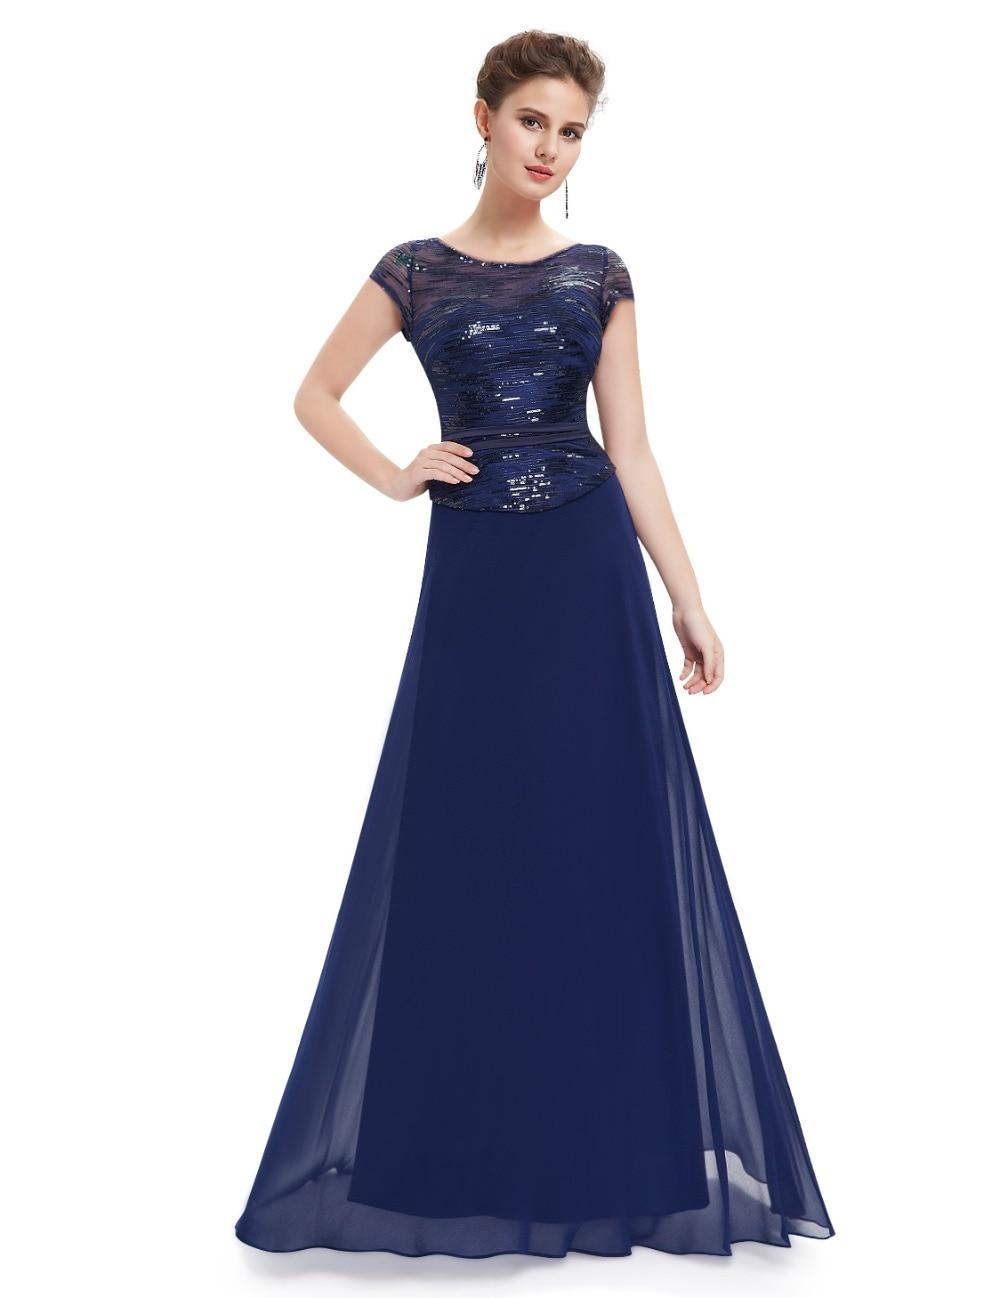 Short Sleeve Navy Blue Mother of the Bride Dresses Ever Pretty ... c9a6e31a8454